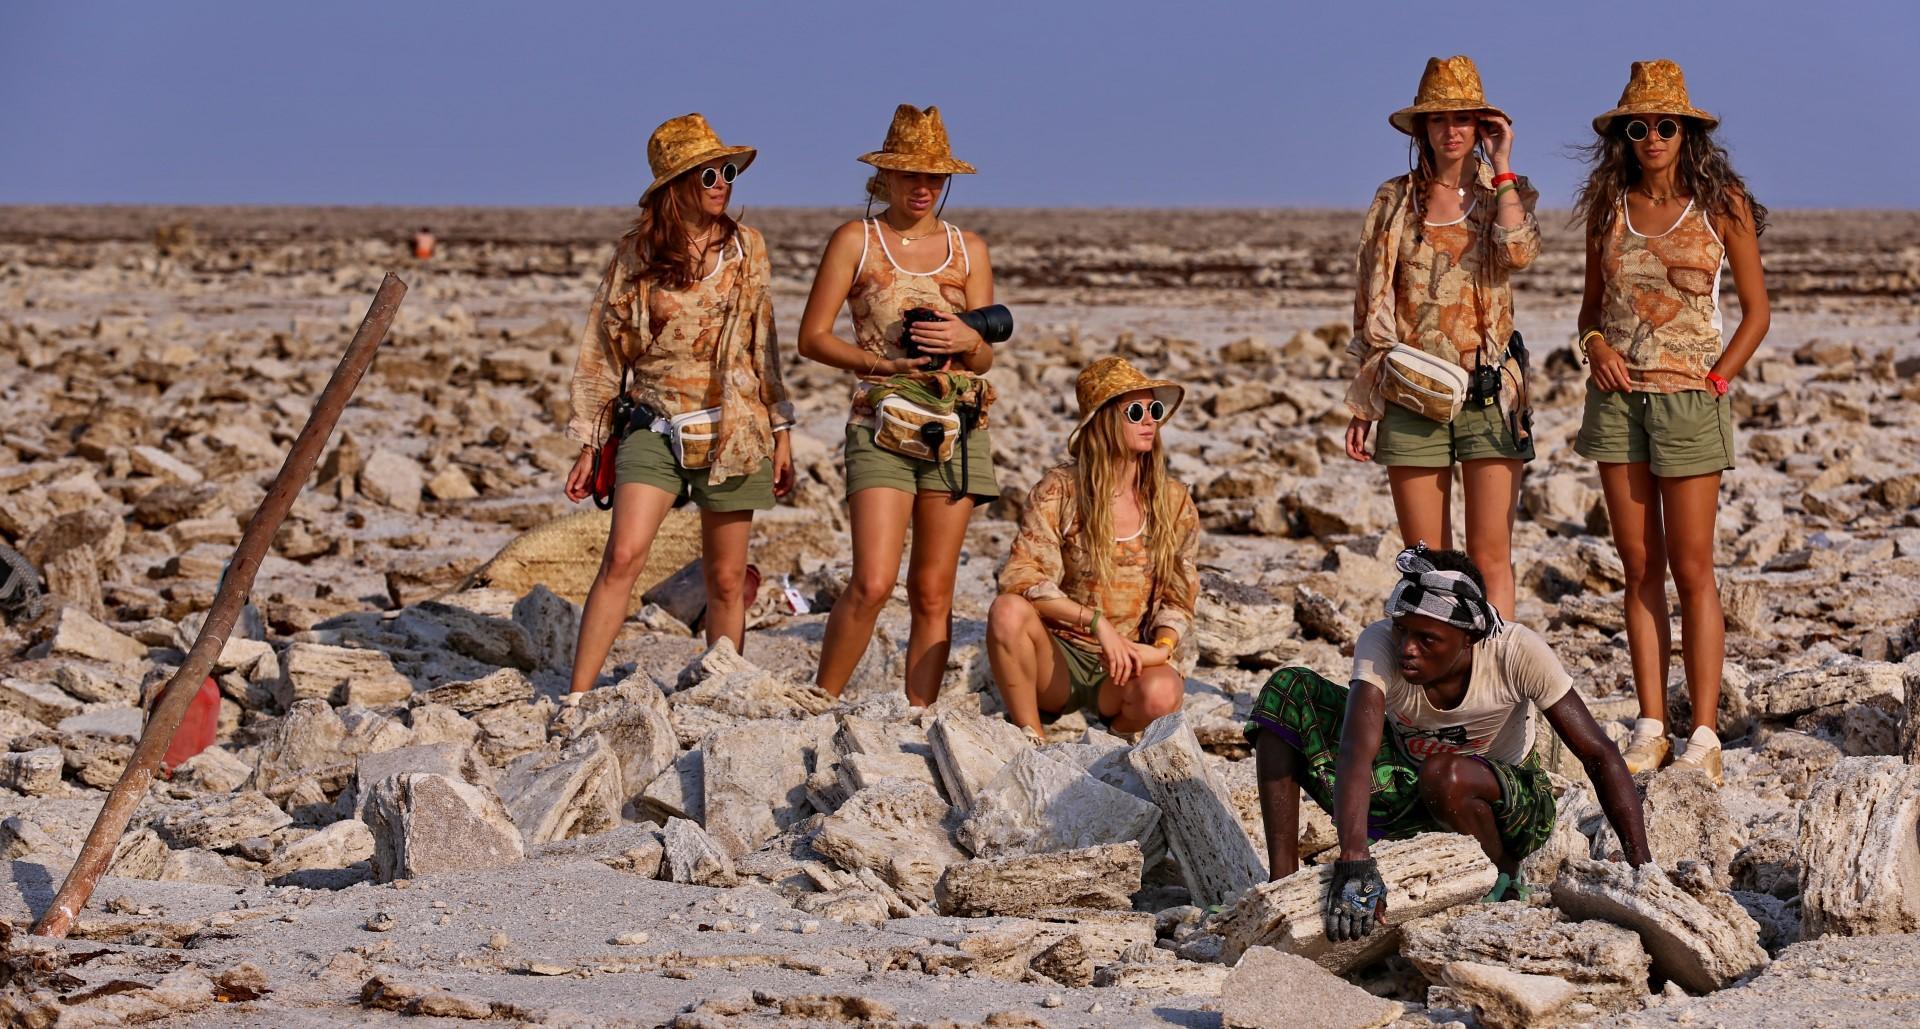 Donnavventura: in Etiopia con la carovana del sale